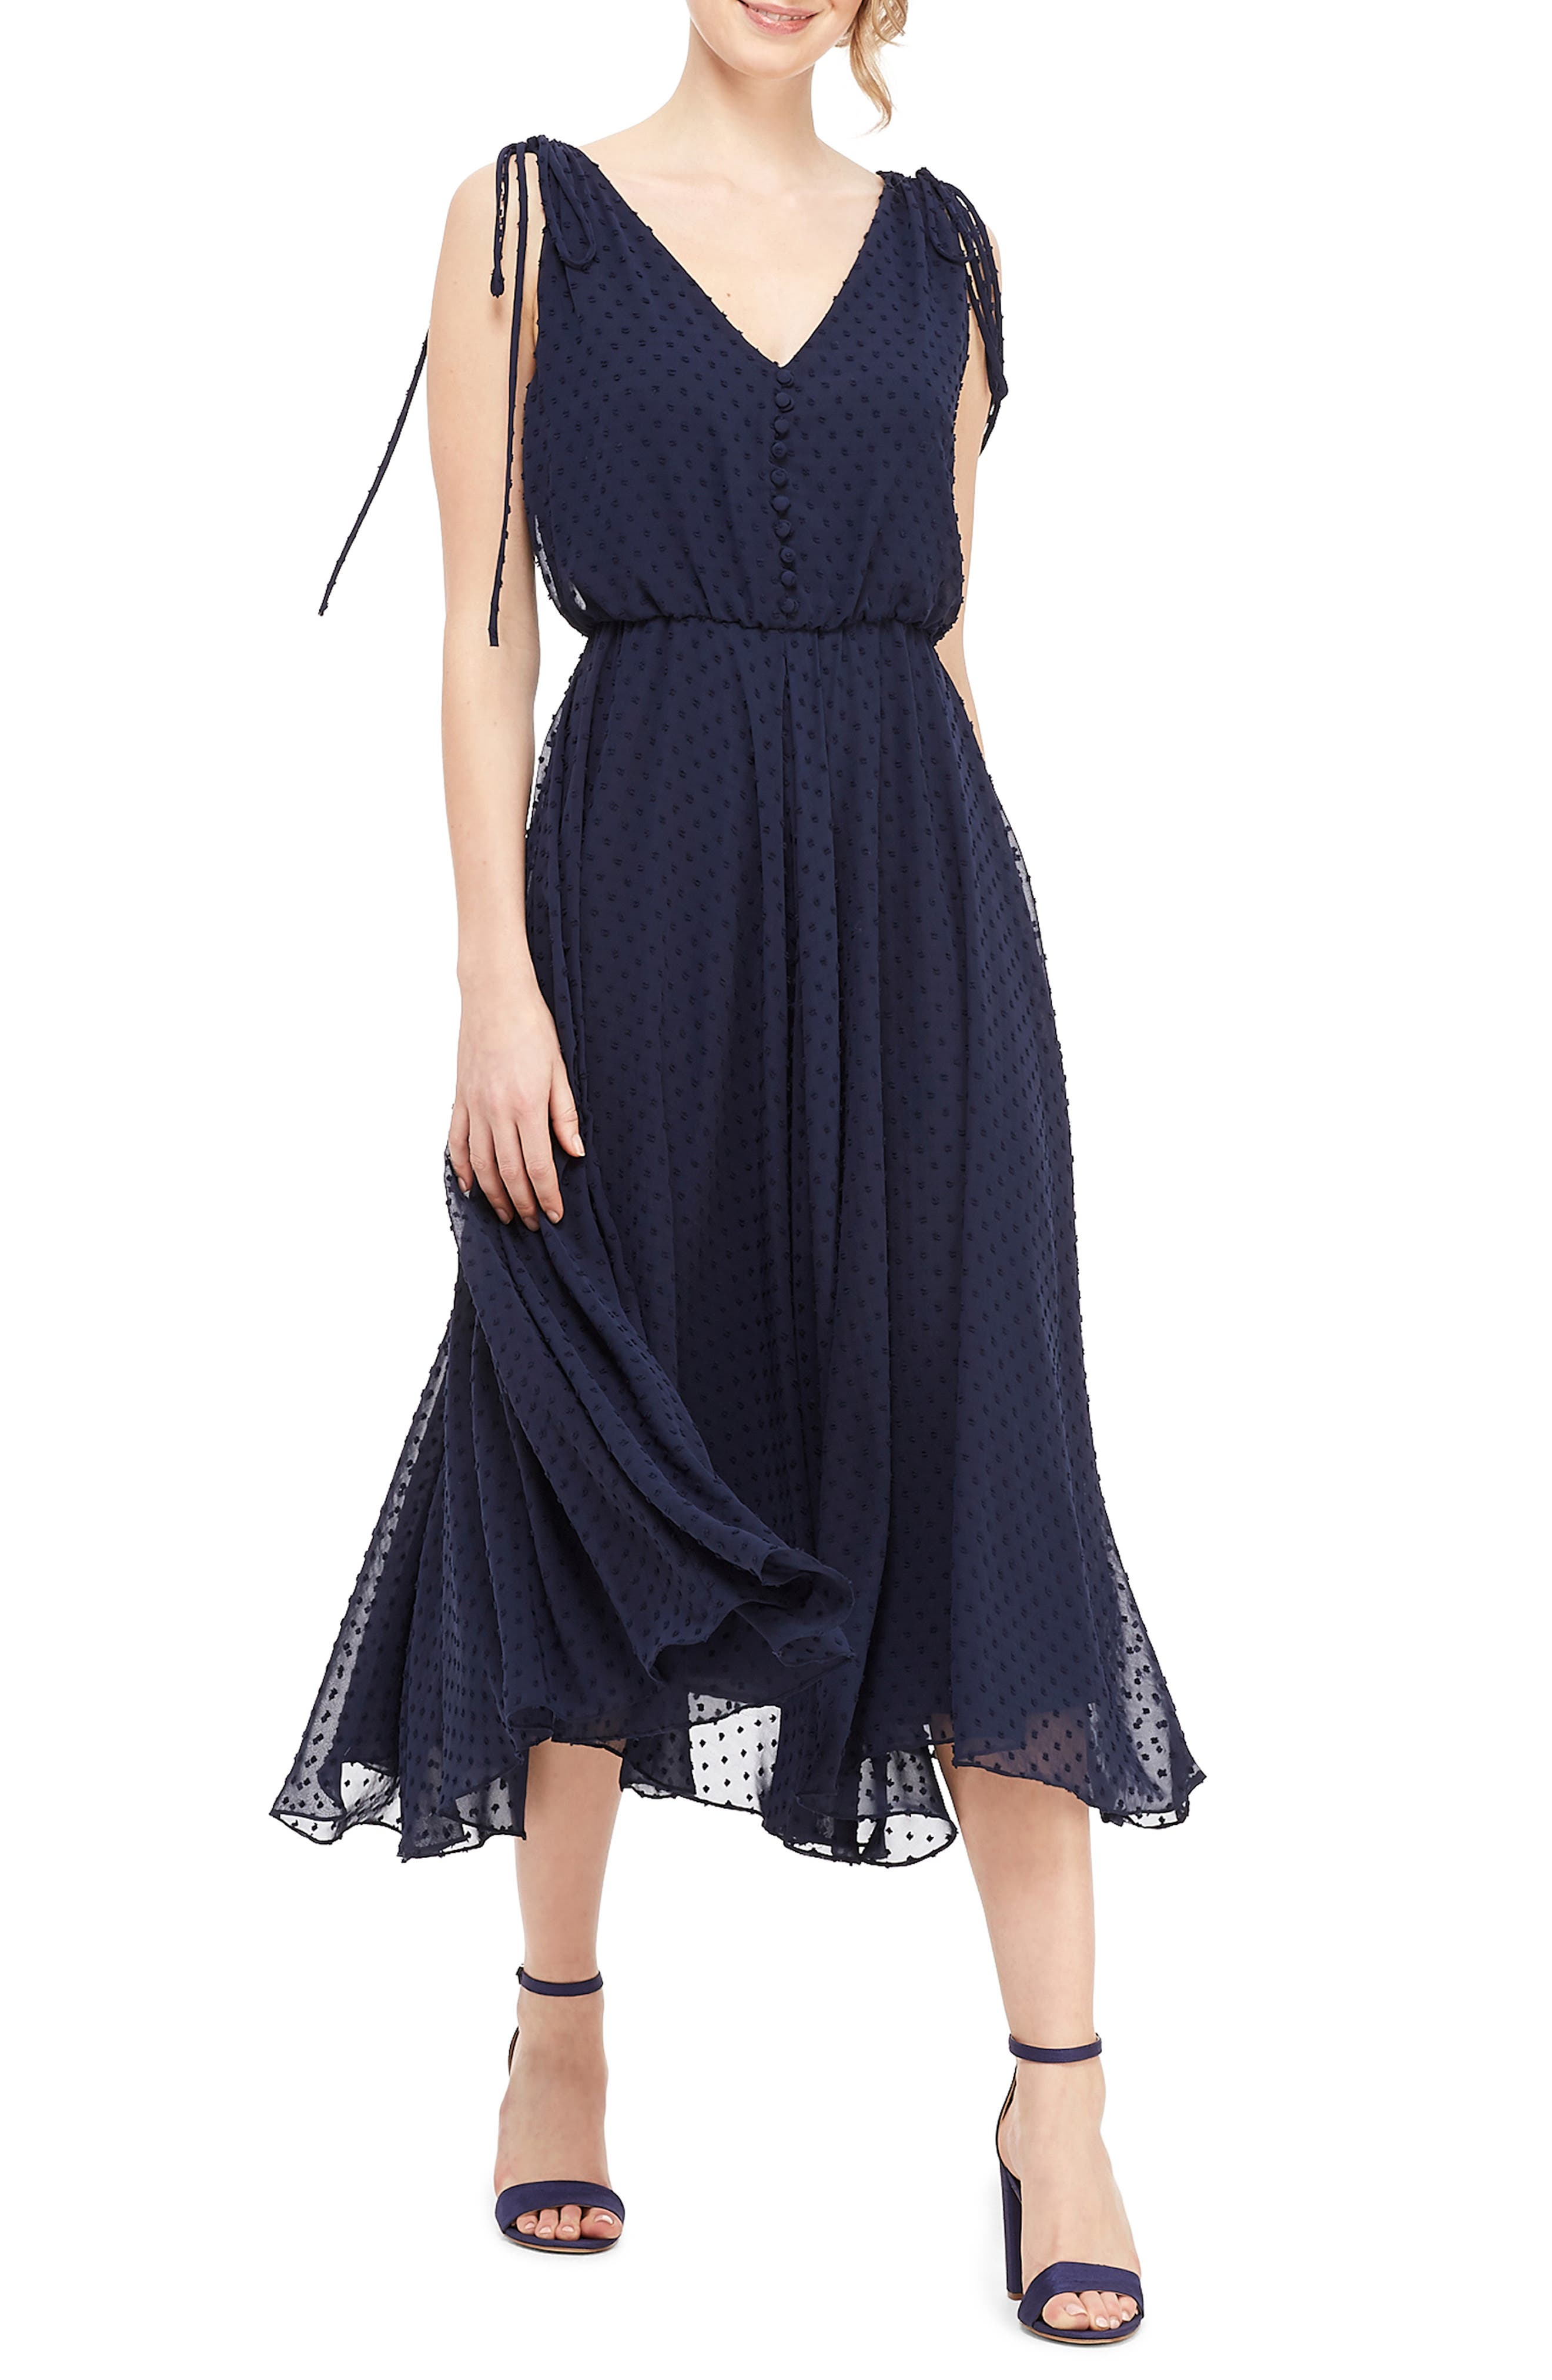 Gal Meets Glam Collection Hillary Clip Dot Chiffon Midi Dress, Blue